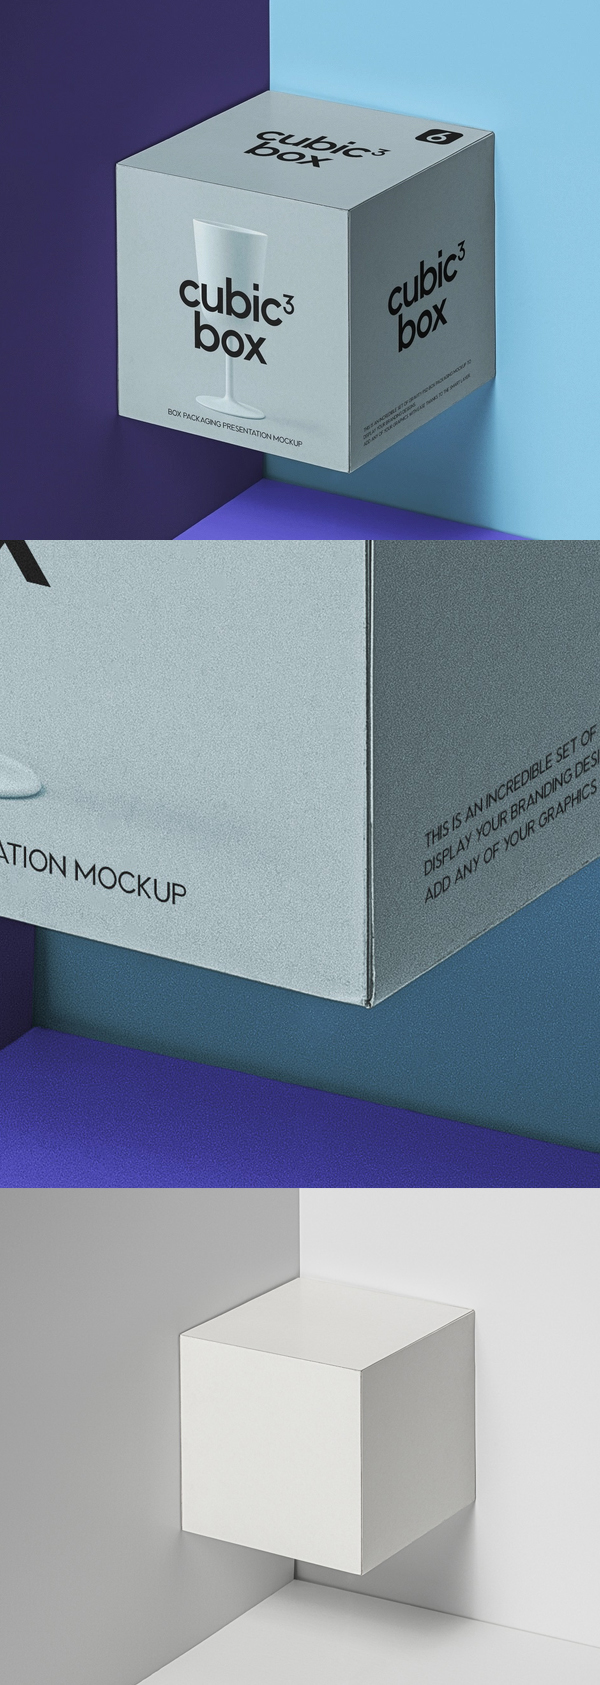 Free Square Psd Product Box Mockup